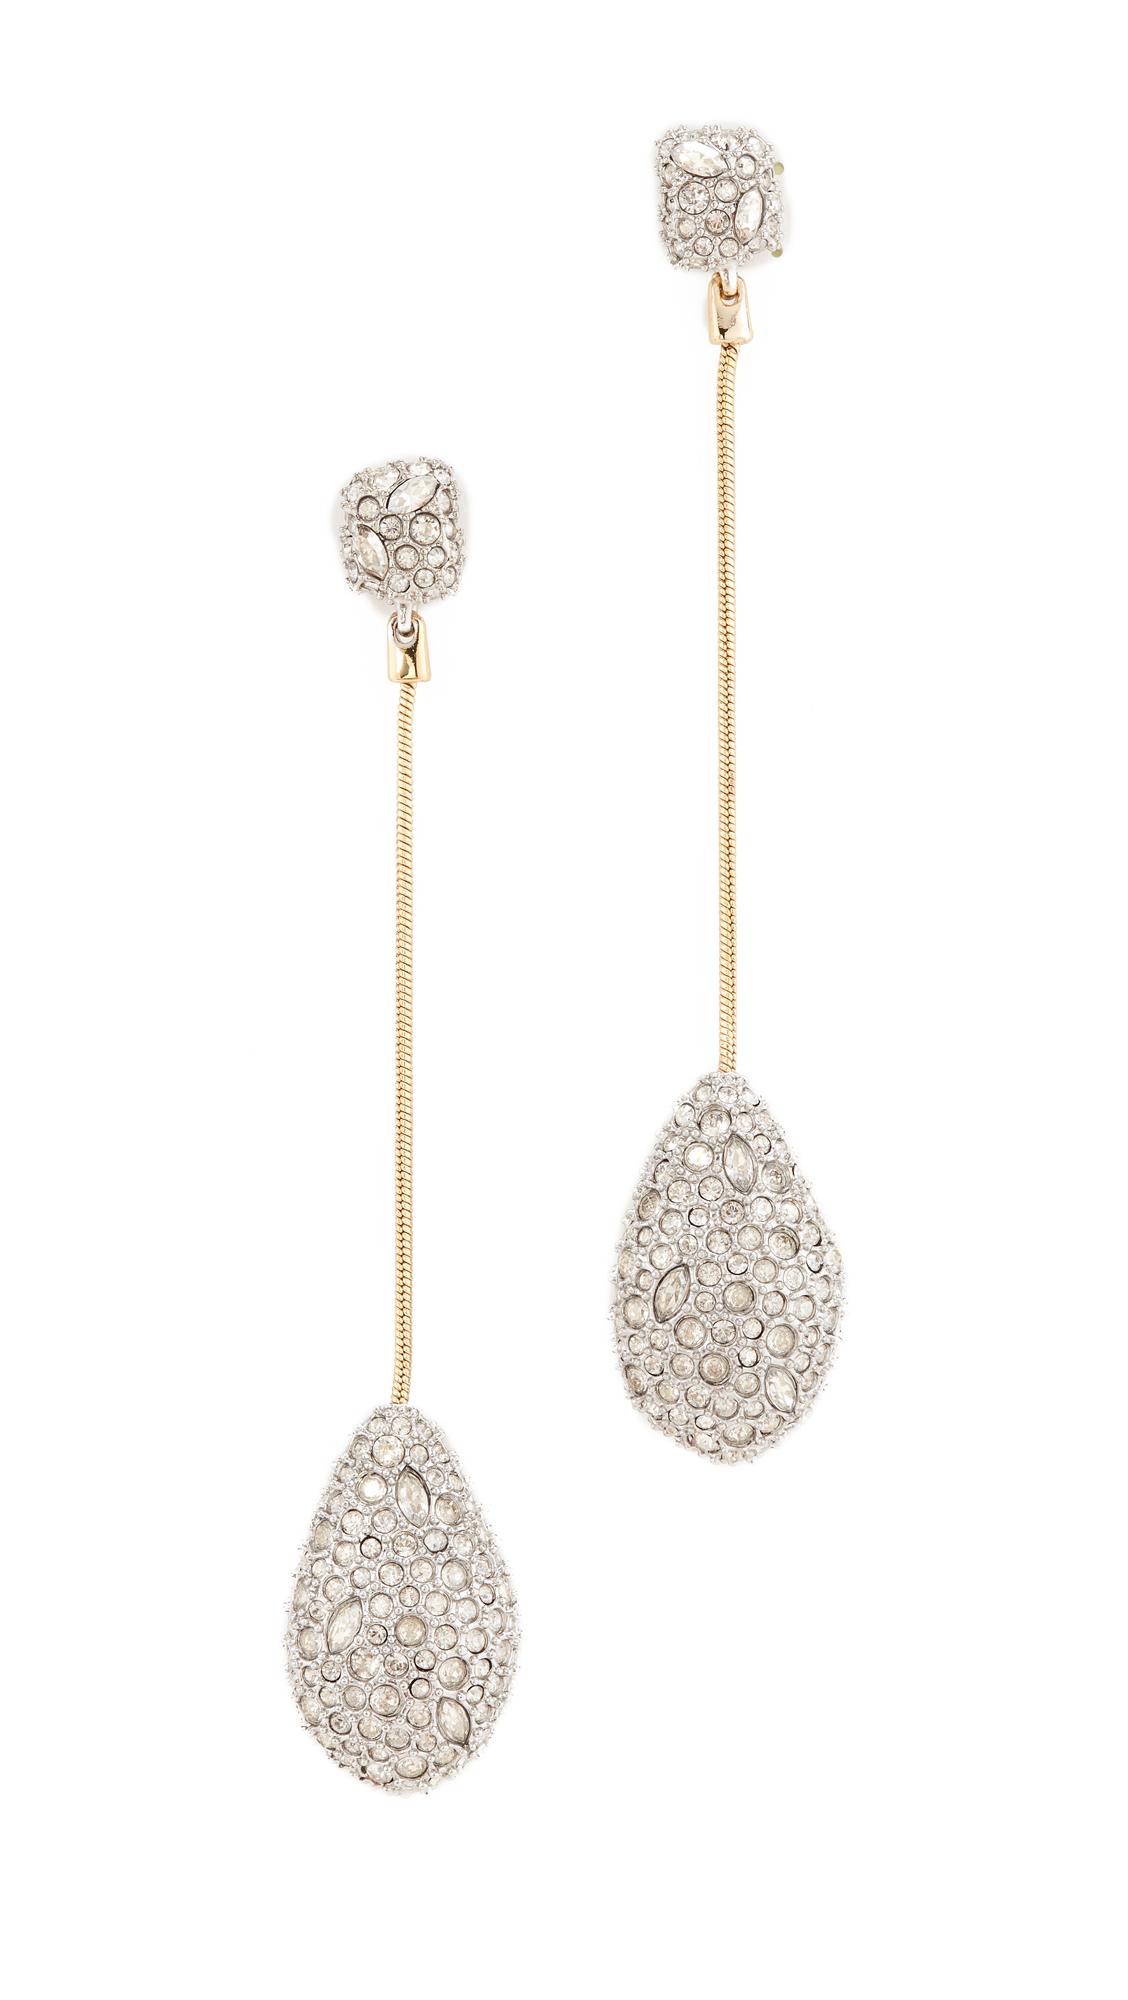 Alexis Bittar Crystal Drop Earrings - Rhodium/Gold